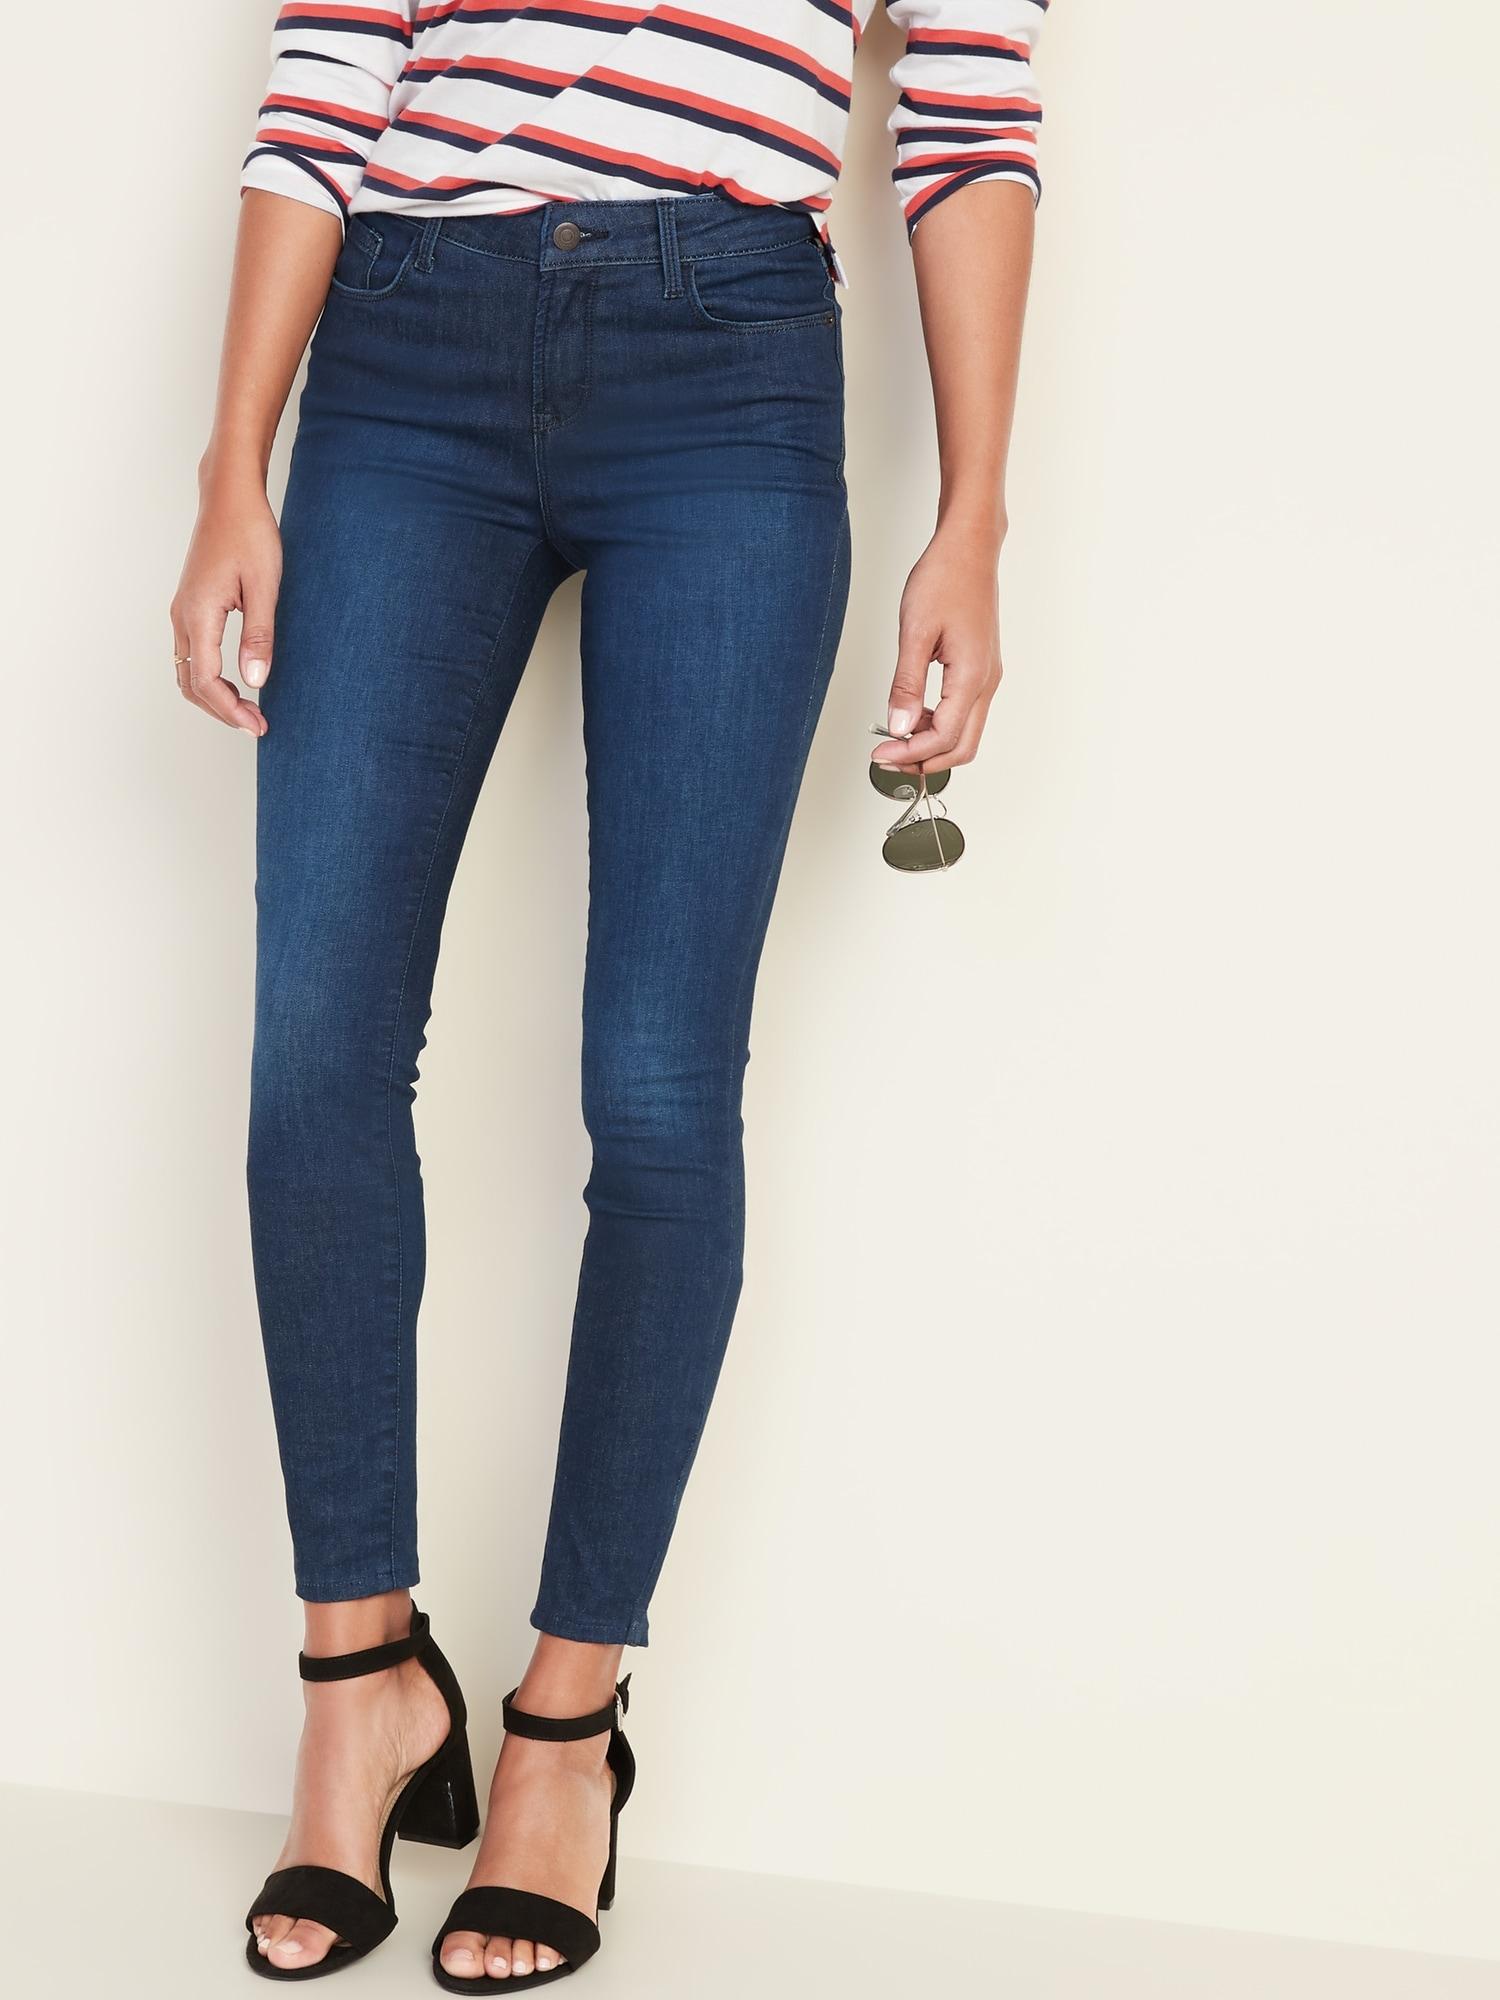 Old Navy Women's 12 Mid-Rise Built-In Warm Rockstar Super Skinny Black Jeans